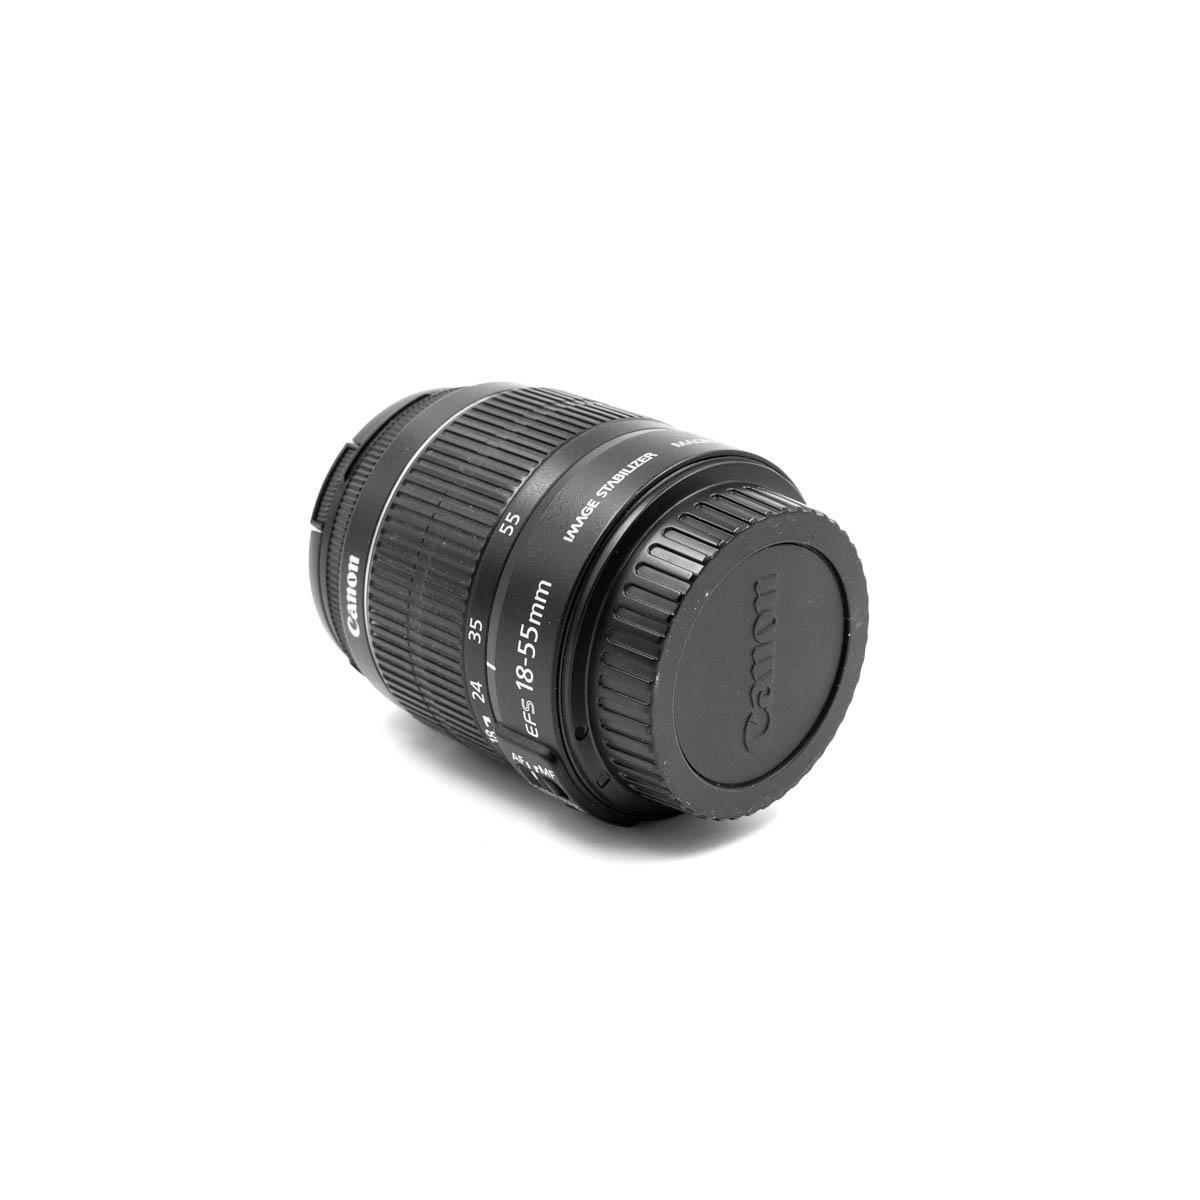 Canon EF-S 18-55mm f/3.5-5.6 IS – Käytetty